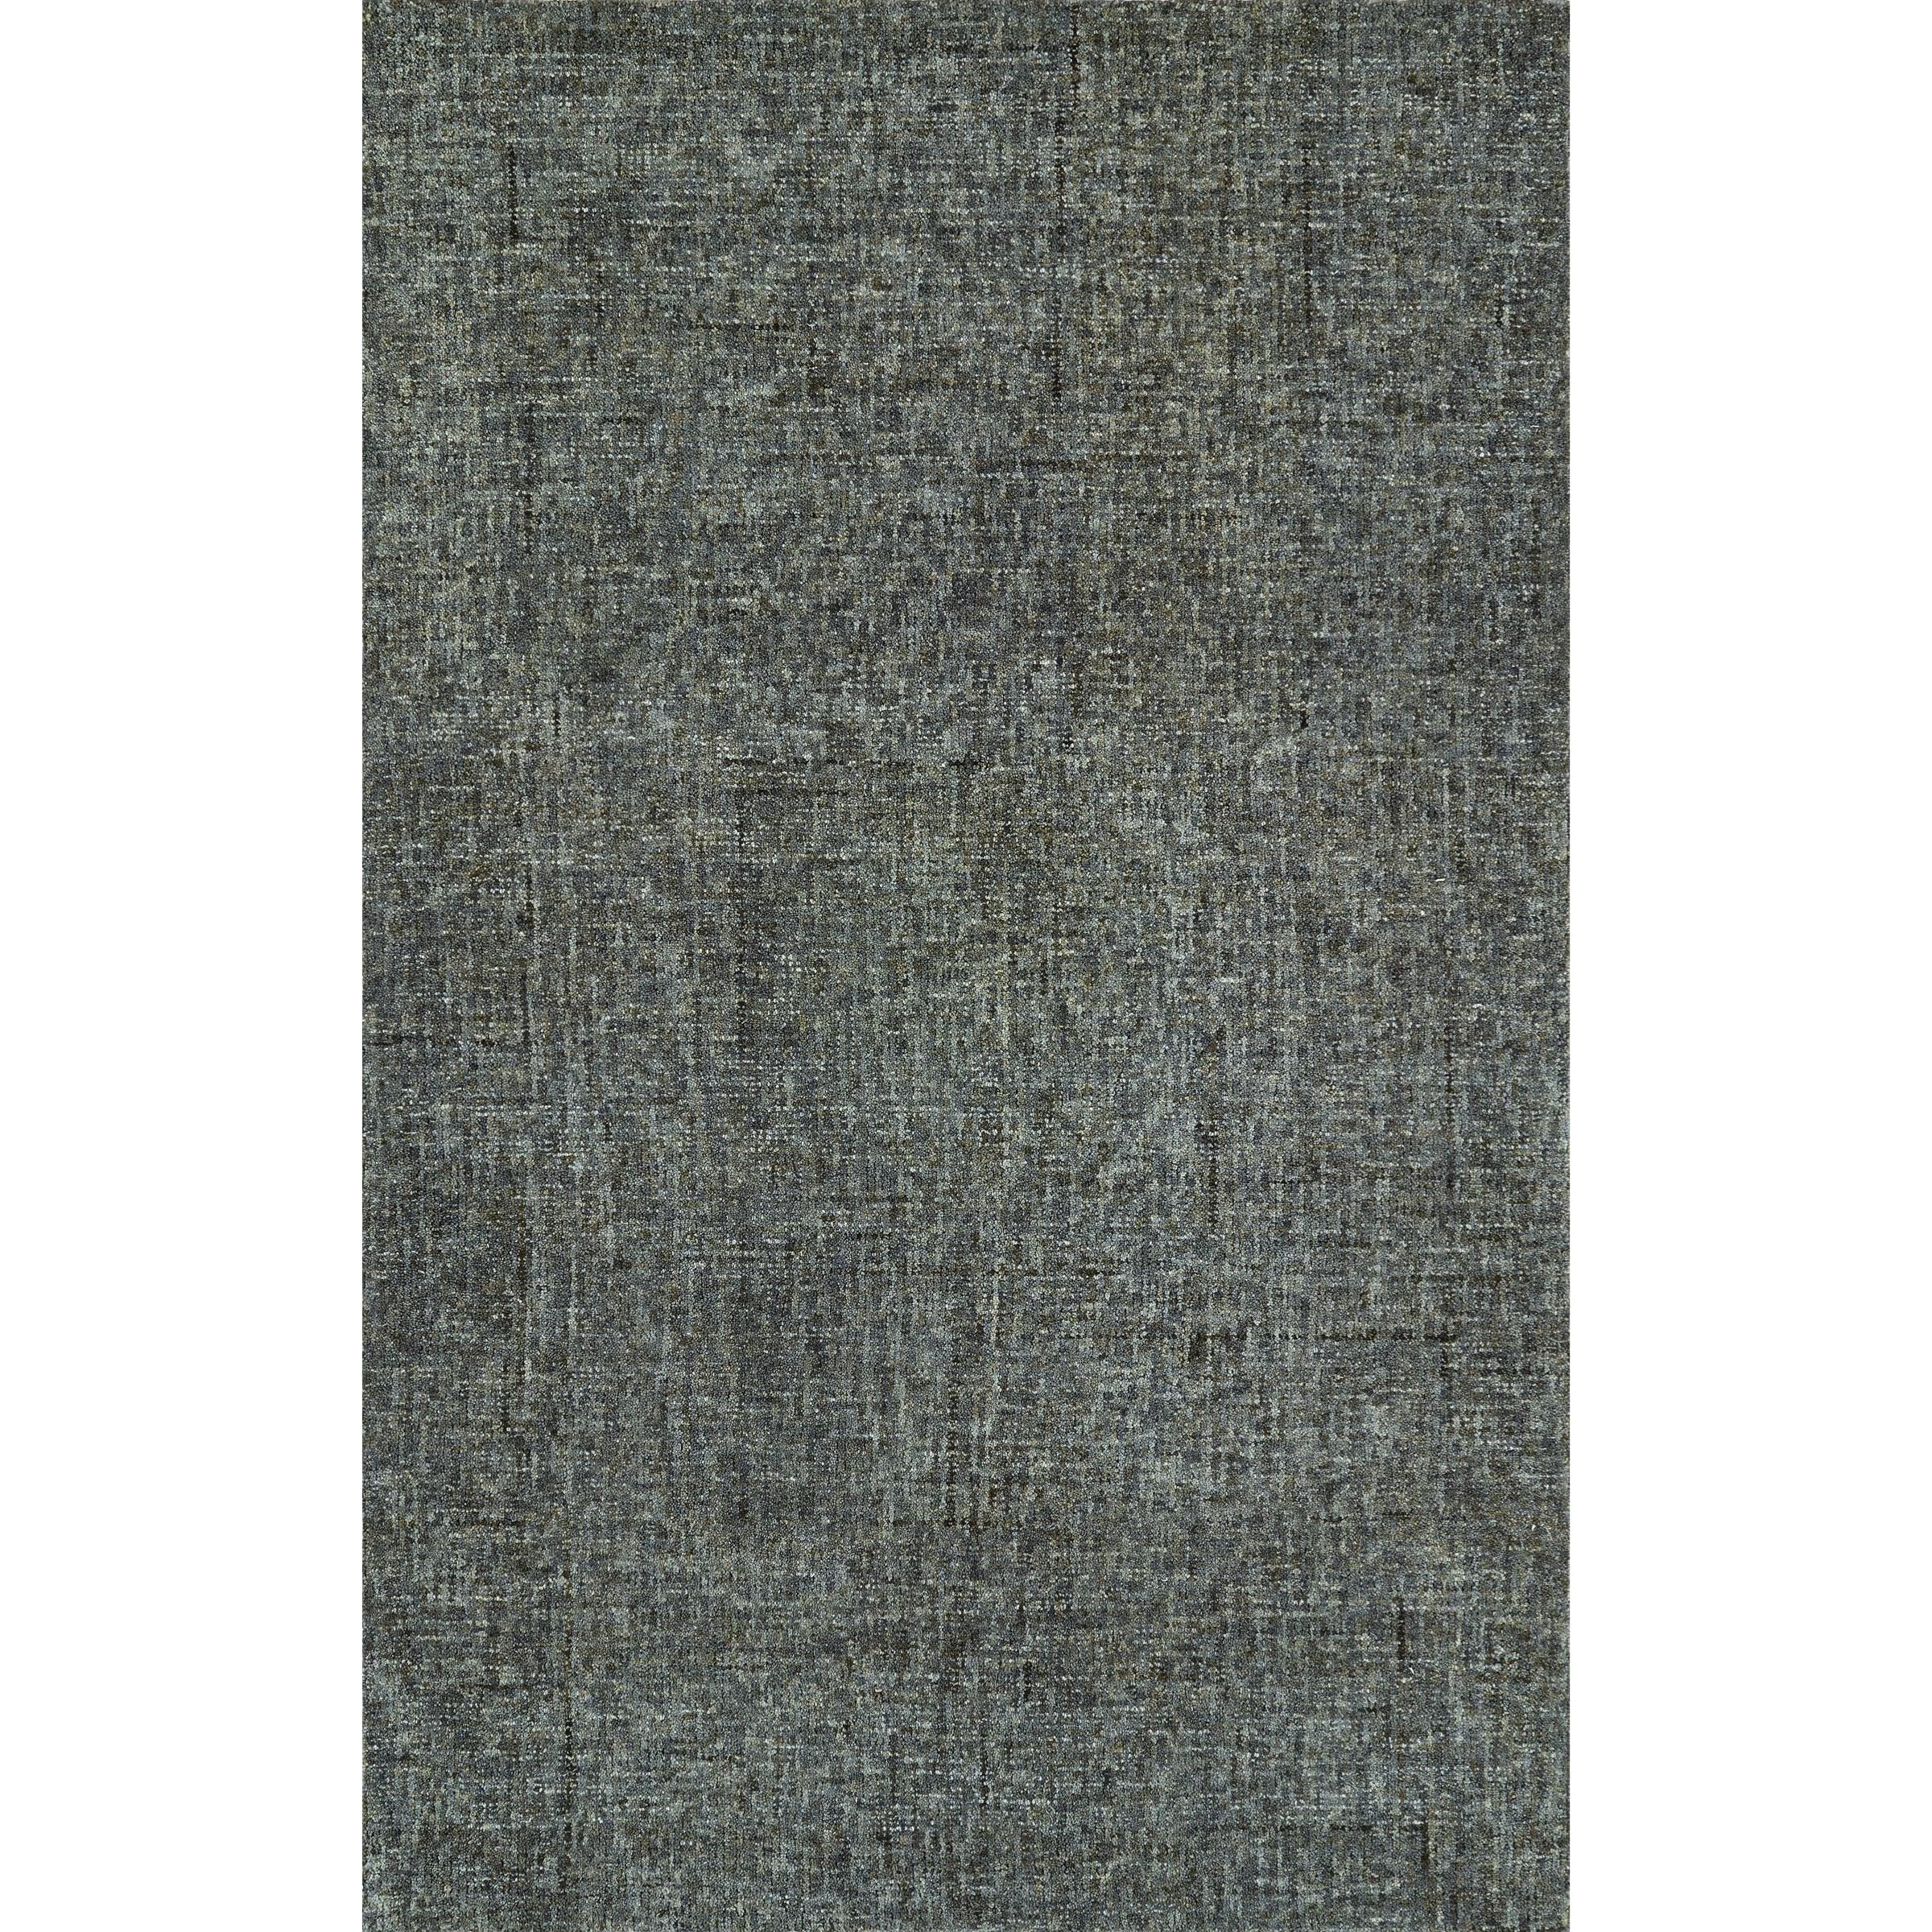 Calisa Carbon 8'X10' Rug by Dalyn at Darvin Furniture